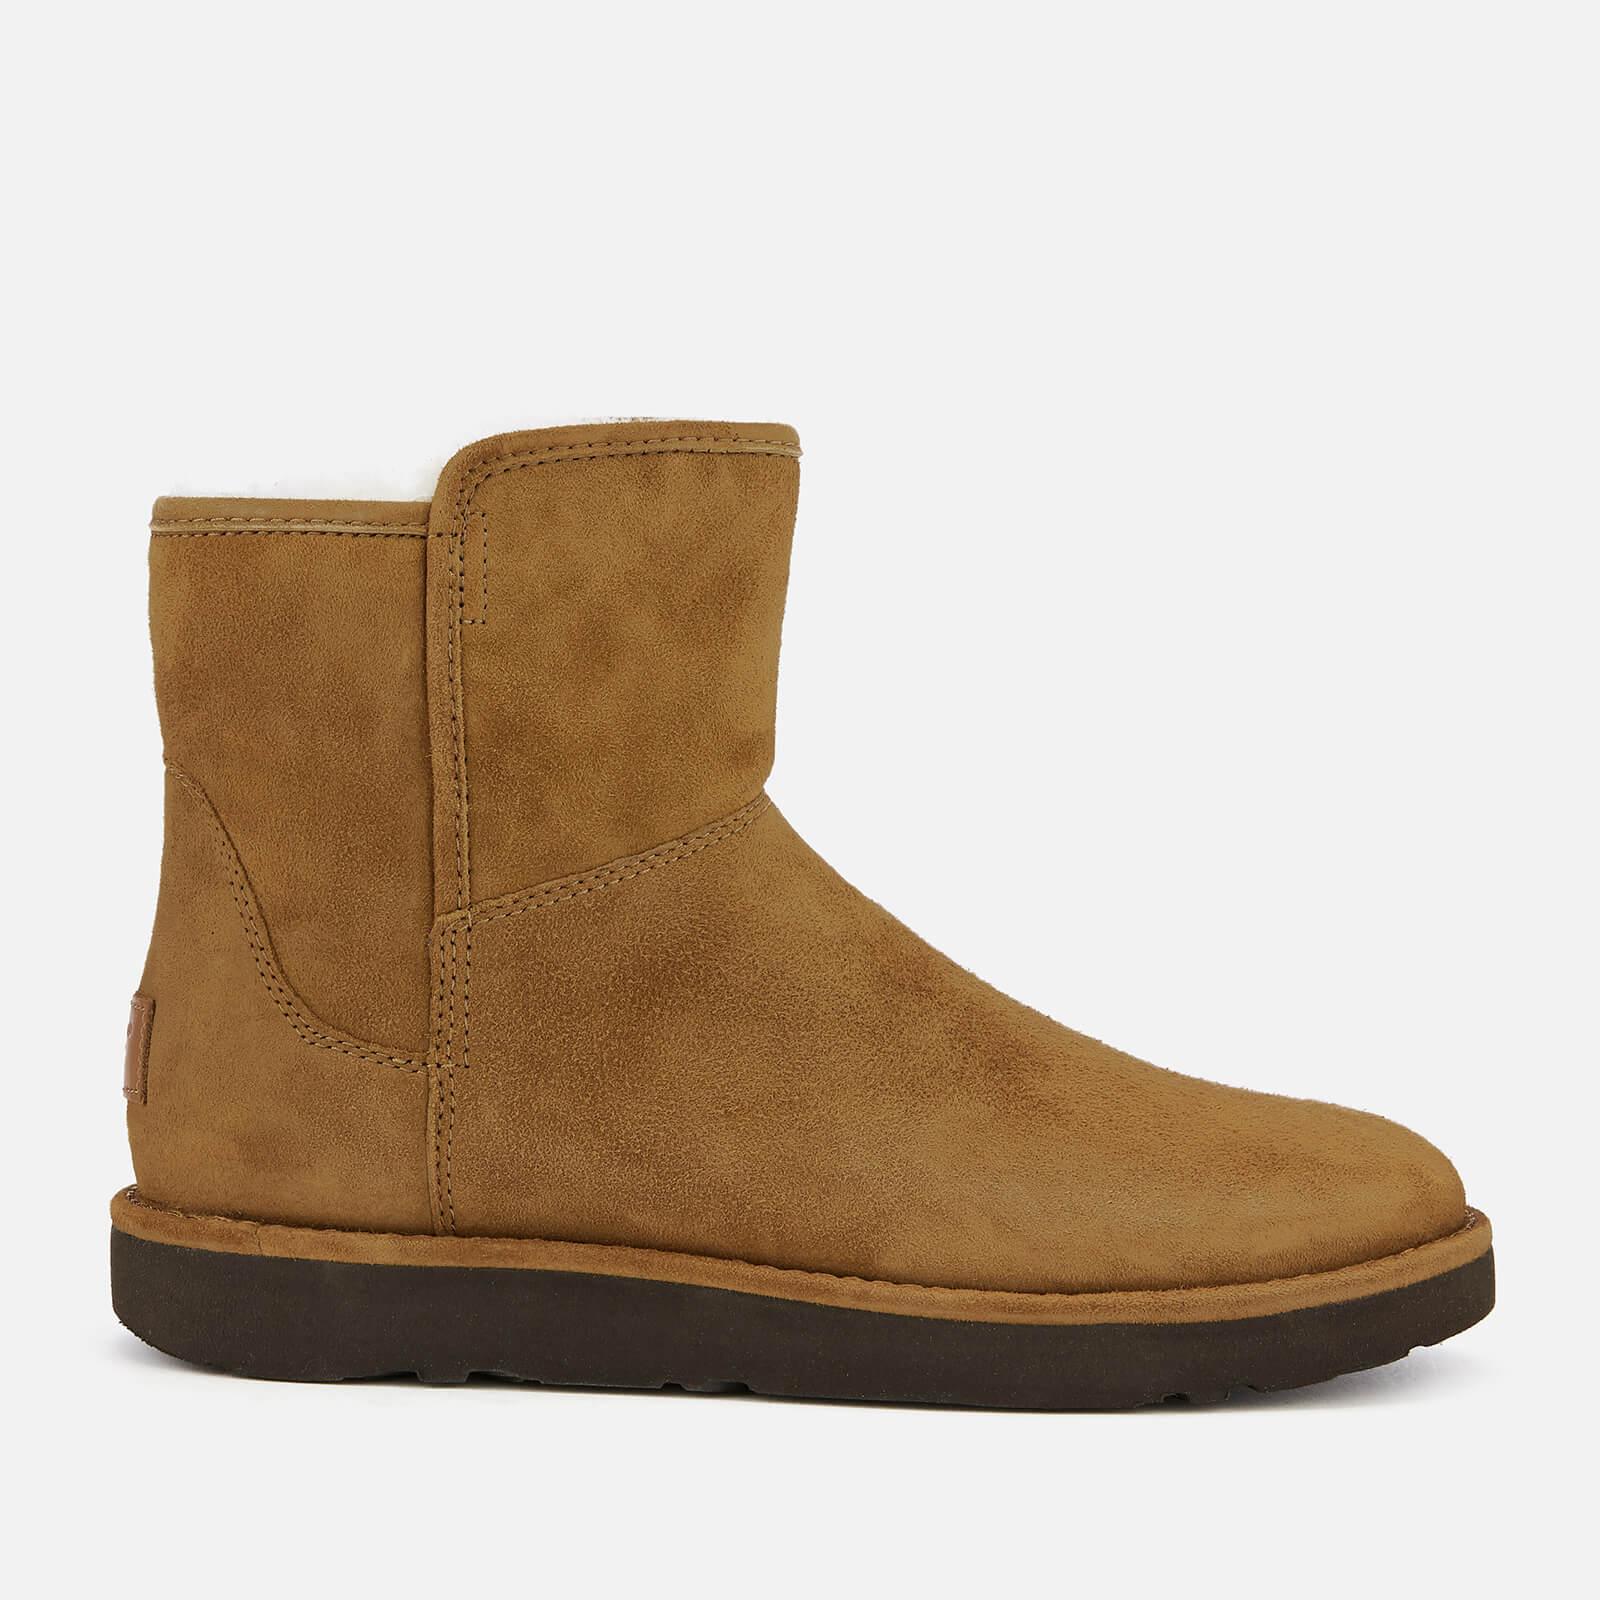 67407579ab4 UGG Women's Abree Mini Sheepskin Boots - Bruno